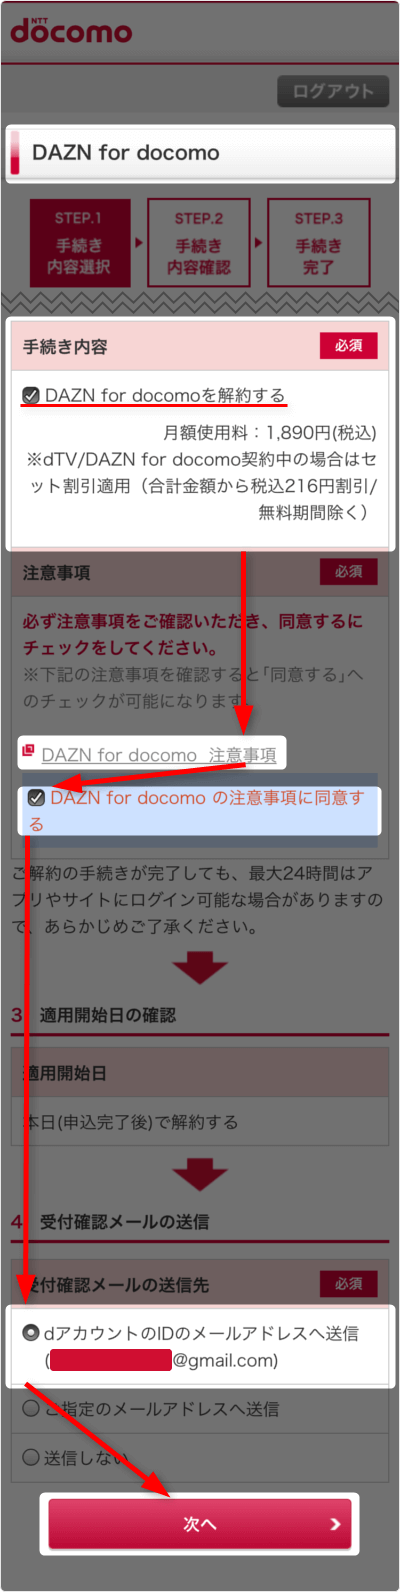 「DAZN for docomoを解約する」「注意事項」「チェックボックス」「確認メール設定」などを確認後に、「次へ」をタップ